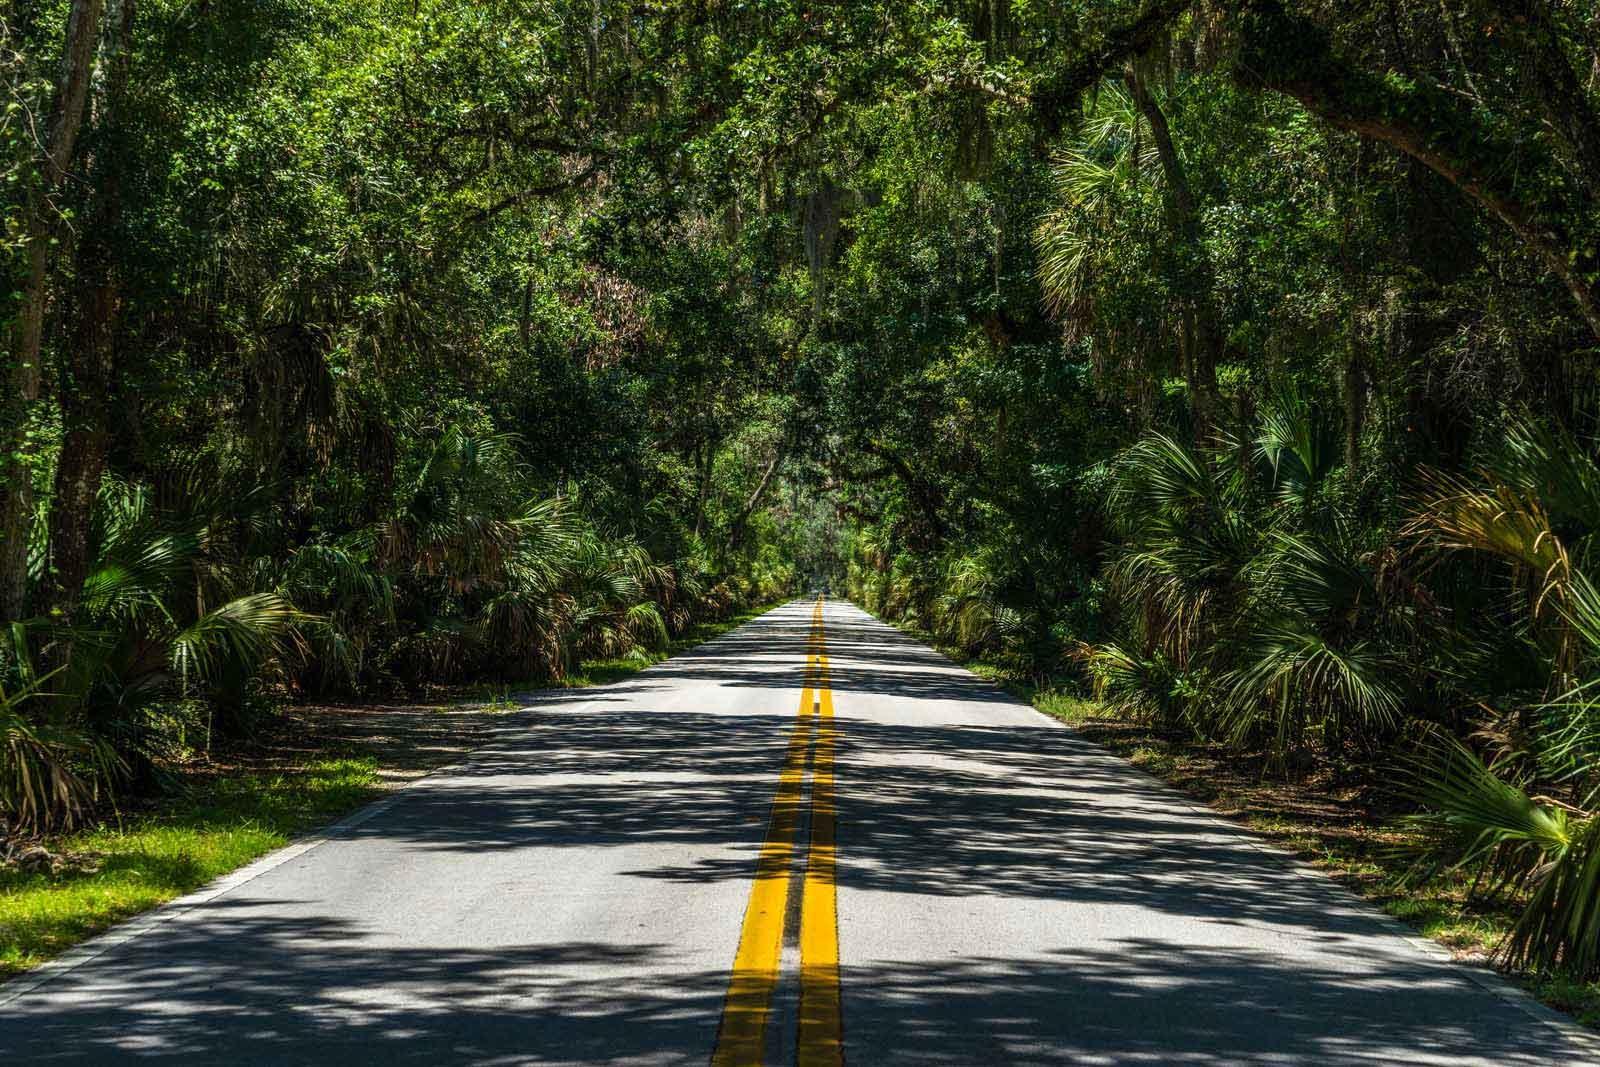 tomoka state park florida road